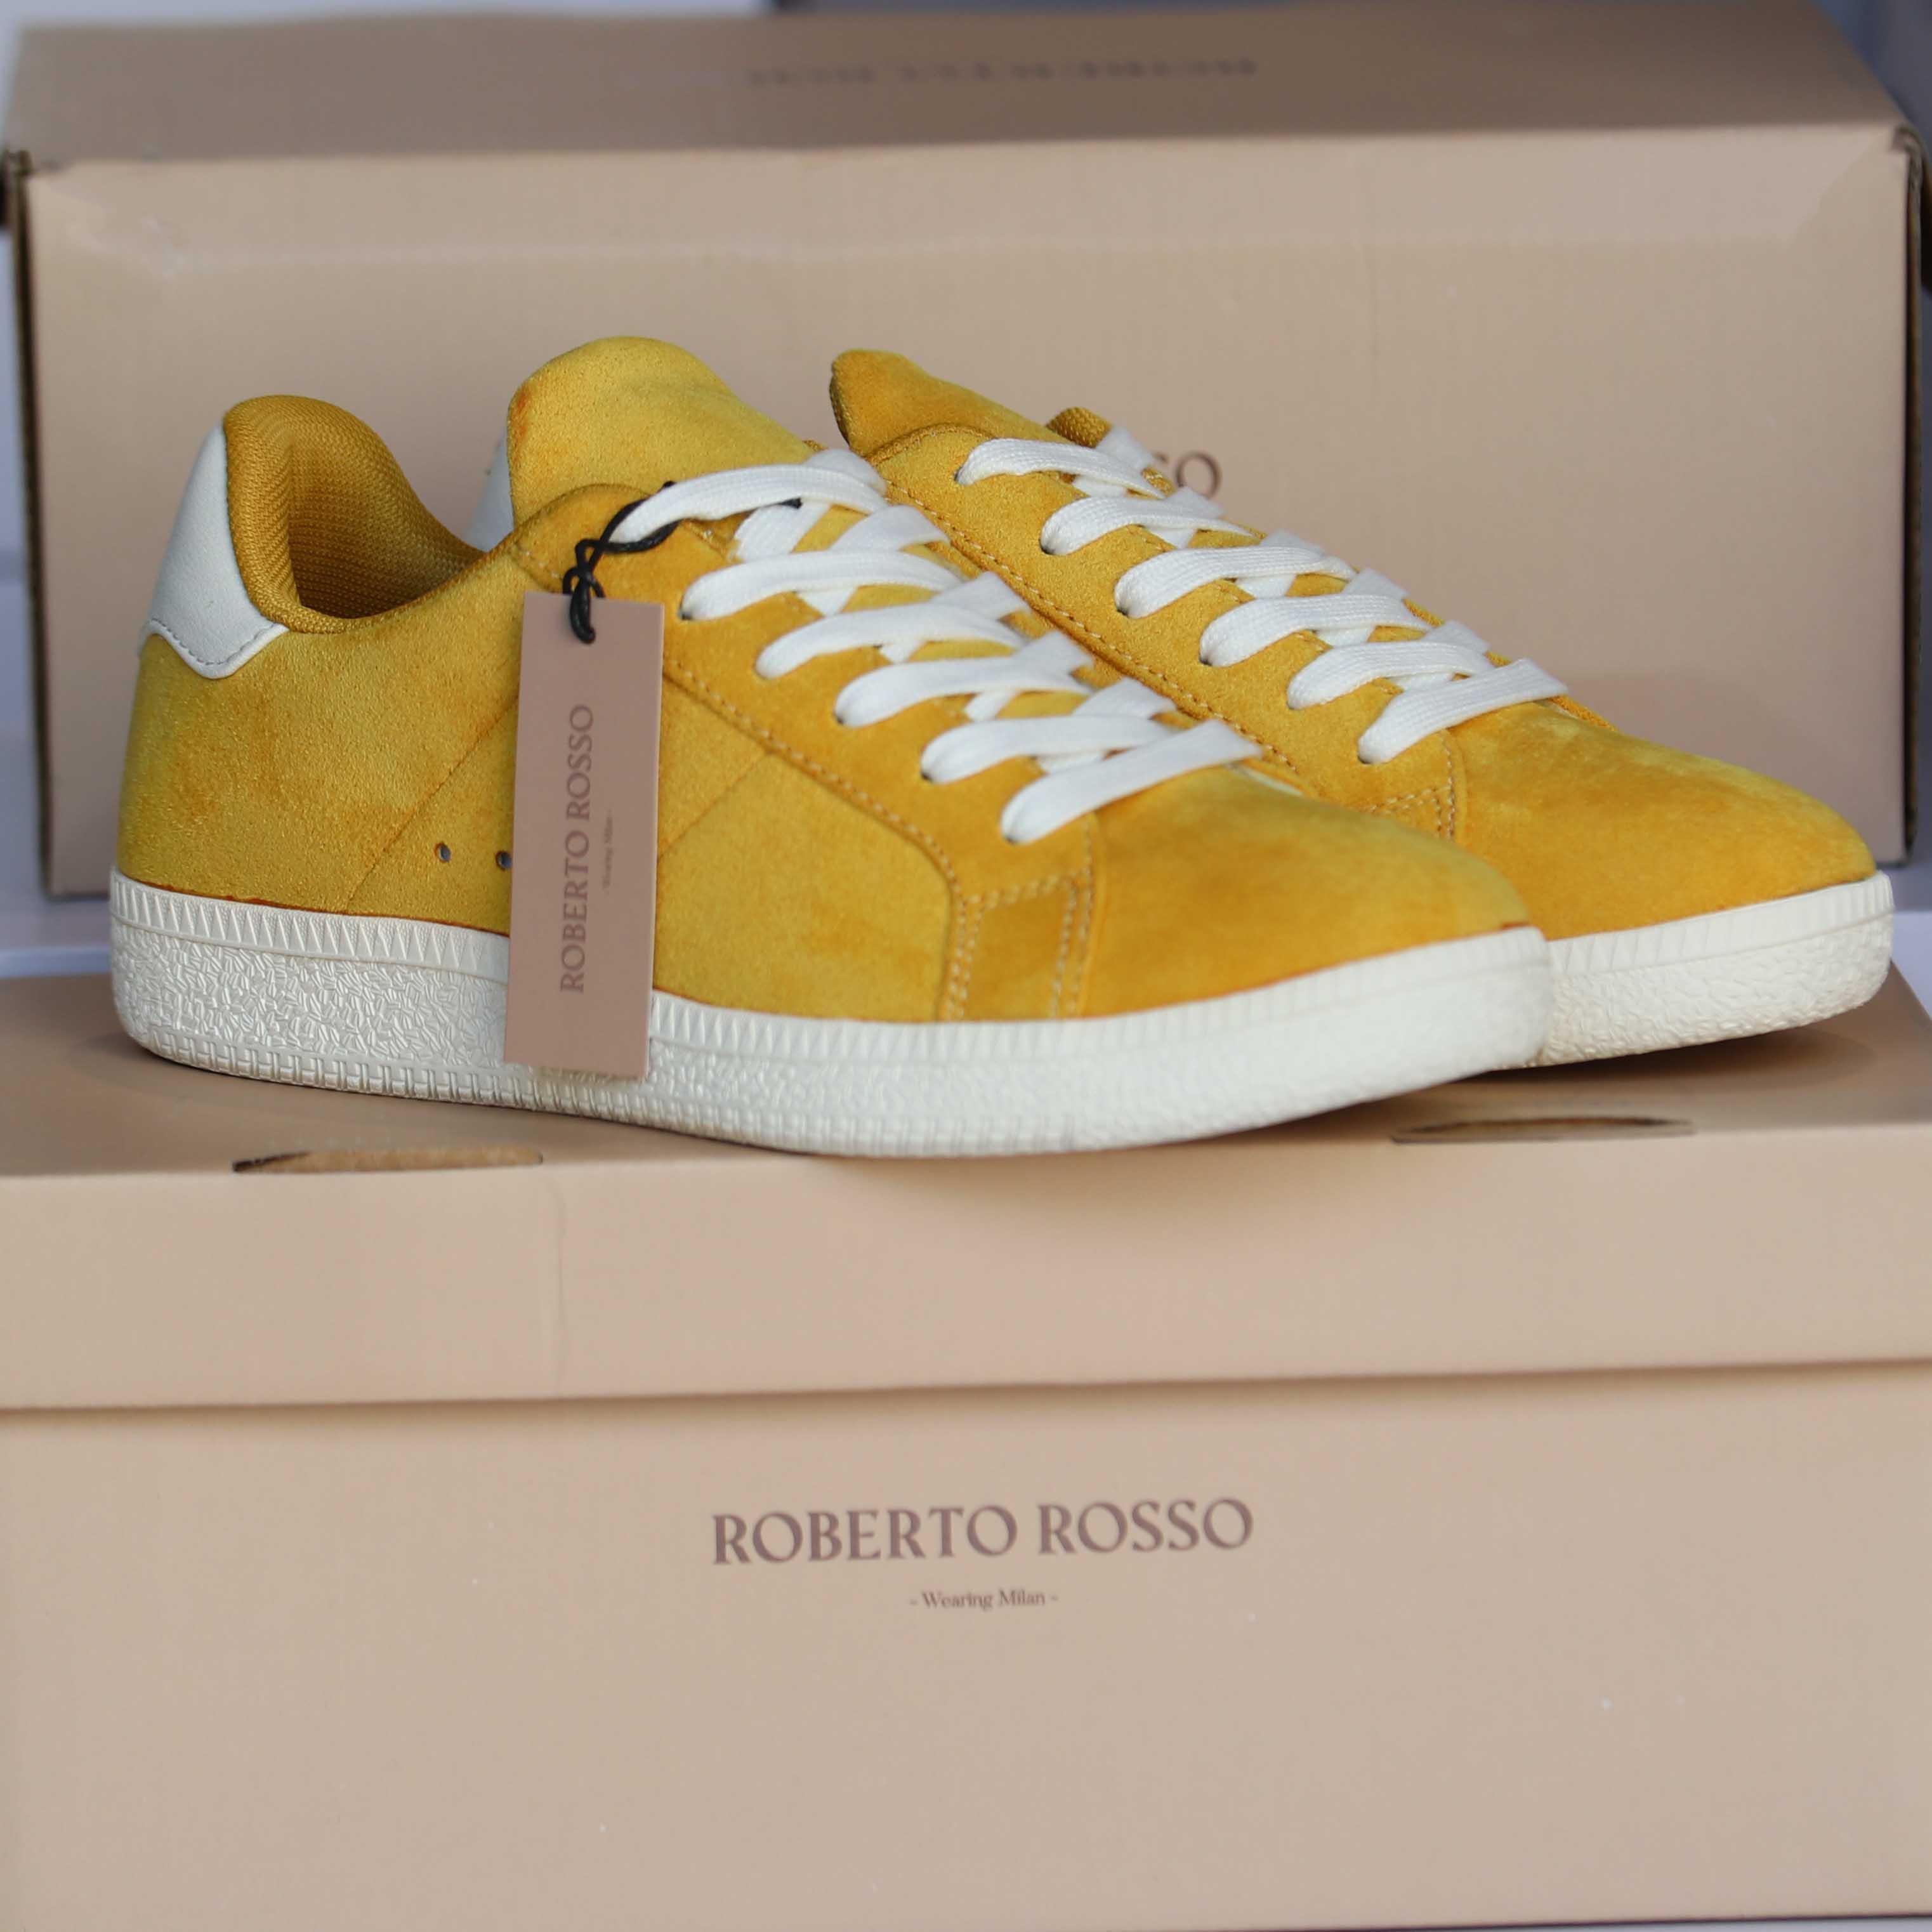 roberto rosso portiva yellow dame sko sommer1